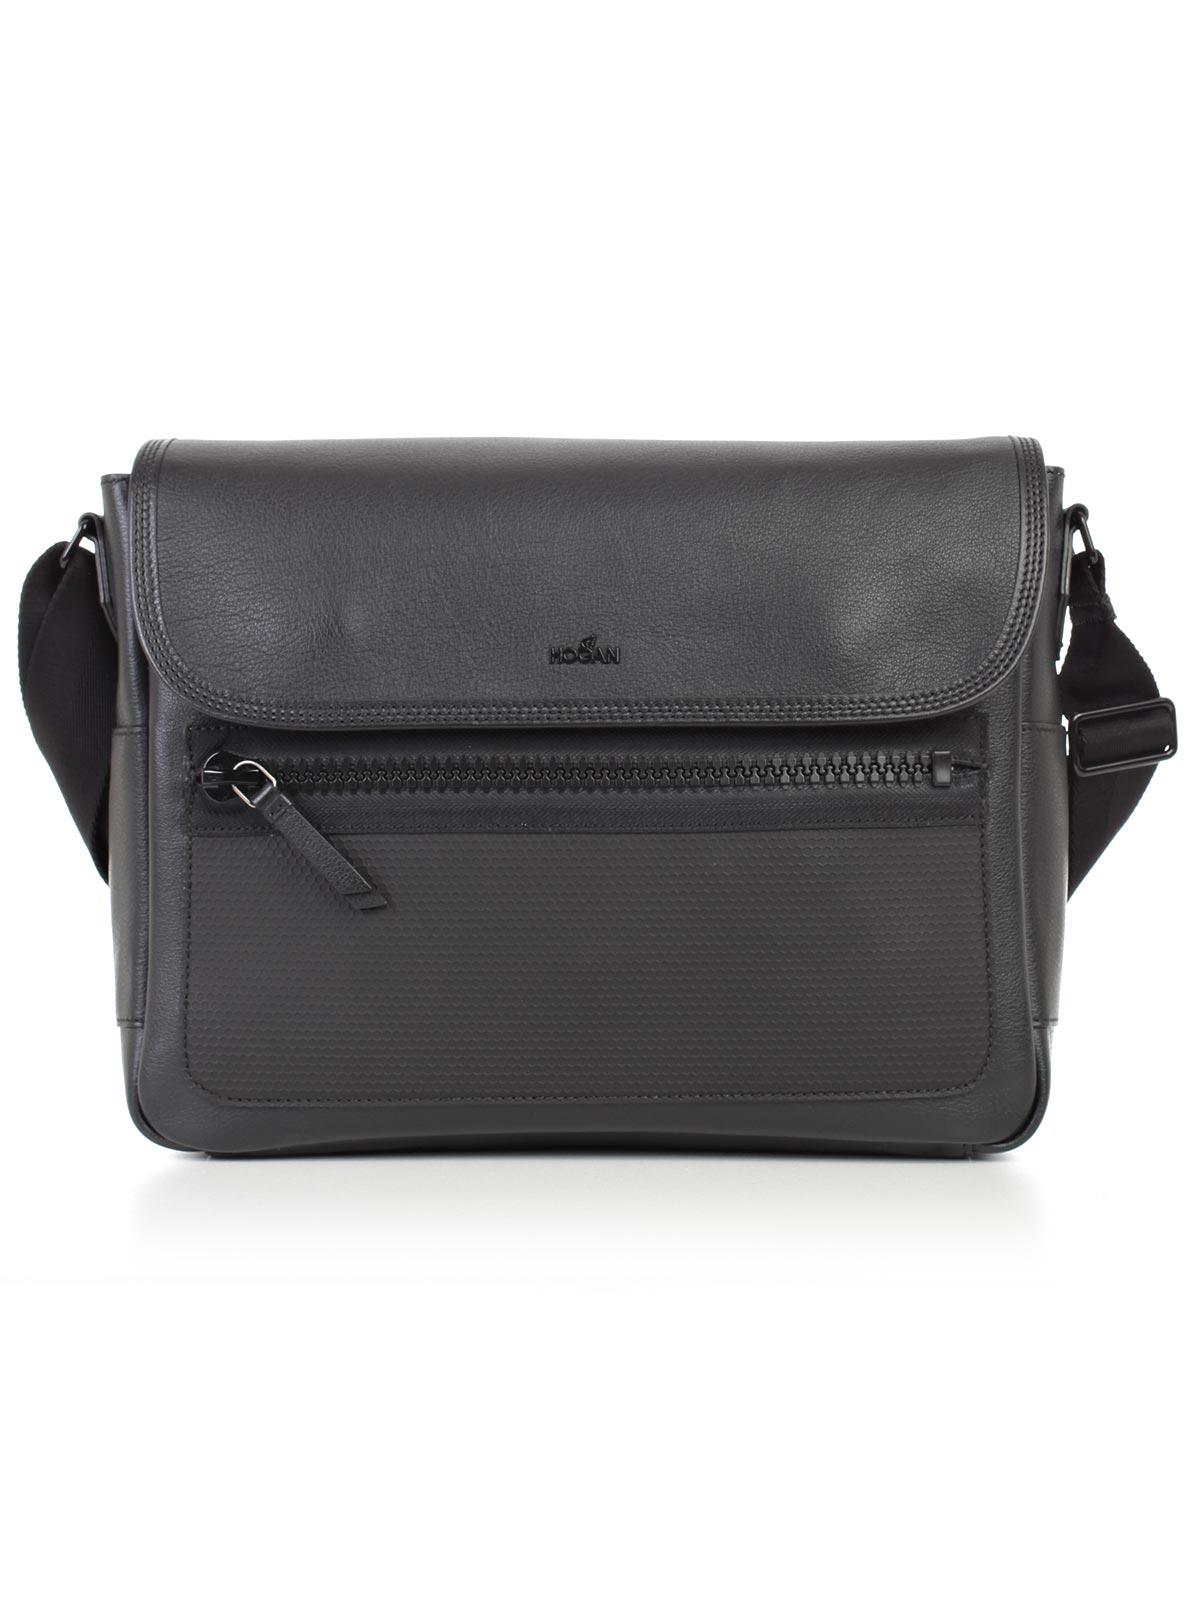 Picture of HOGAN Bags BORSA